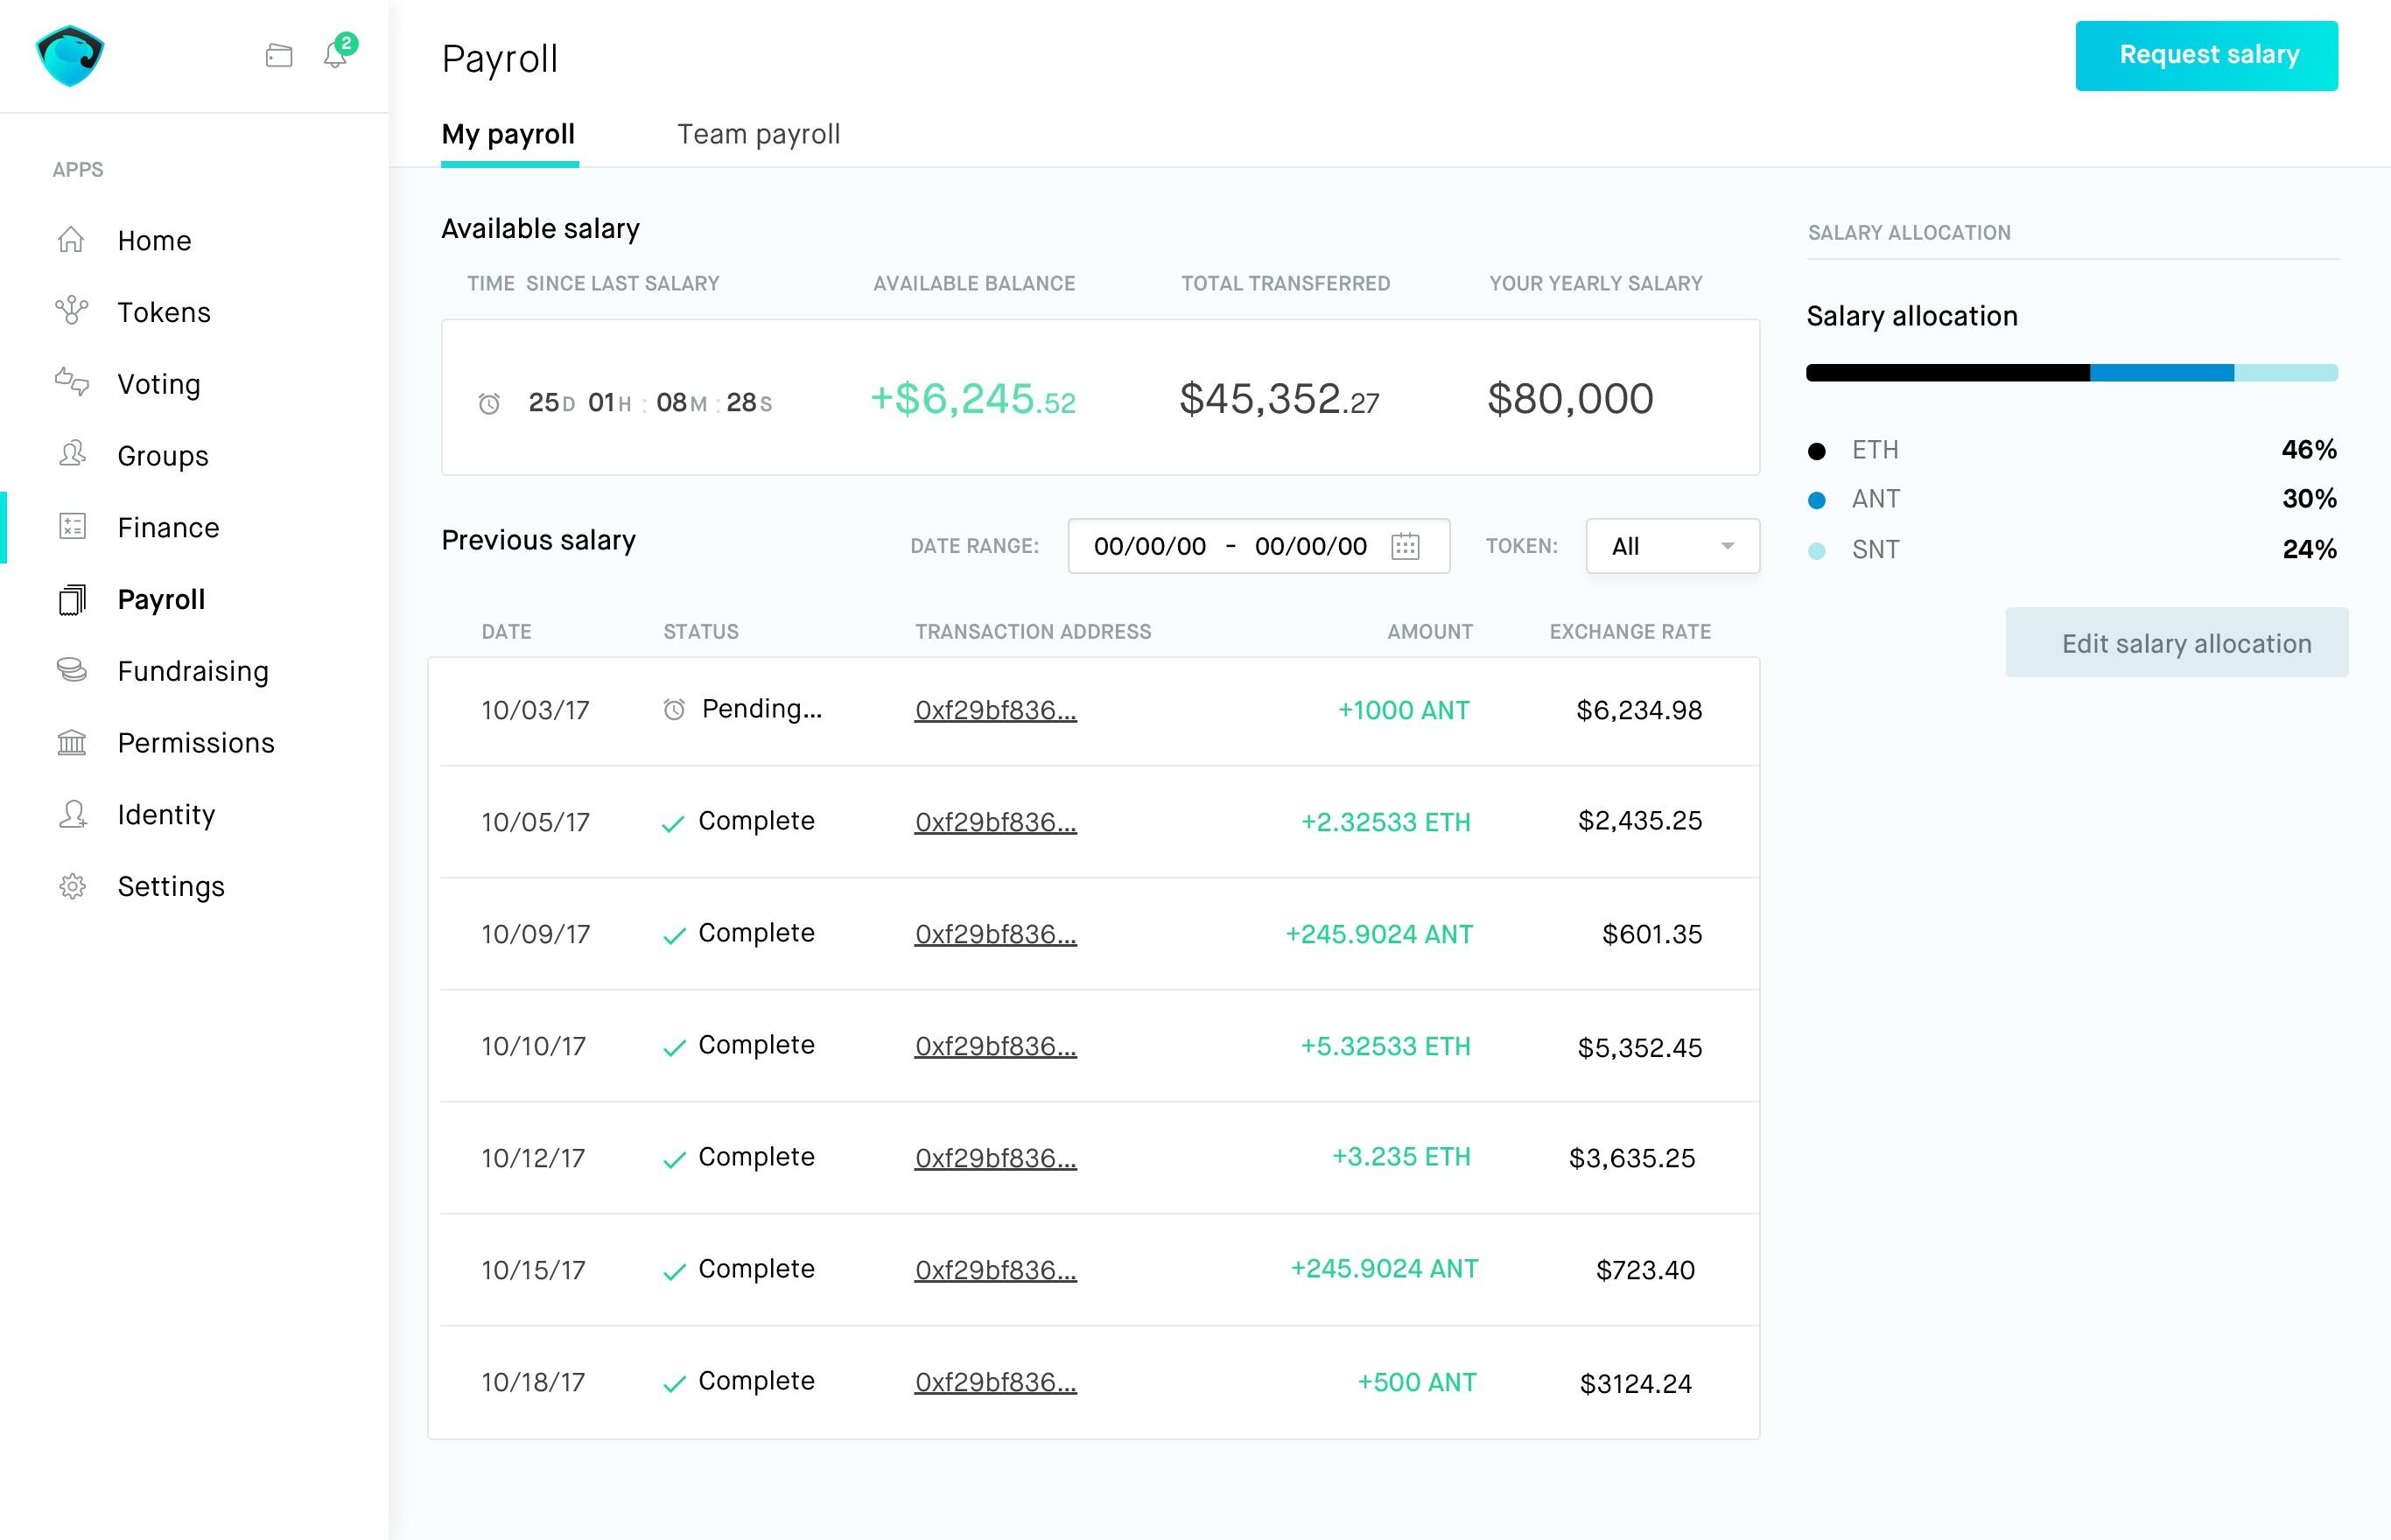 webapp-1366px - finance payroll - my payroll 2x